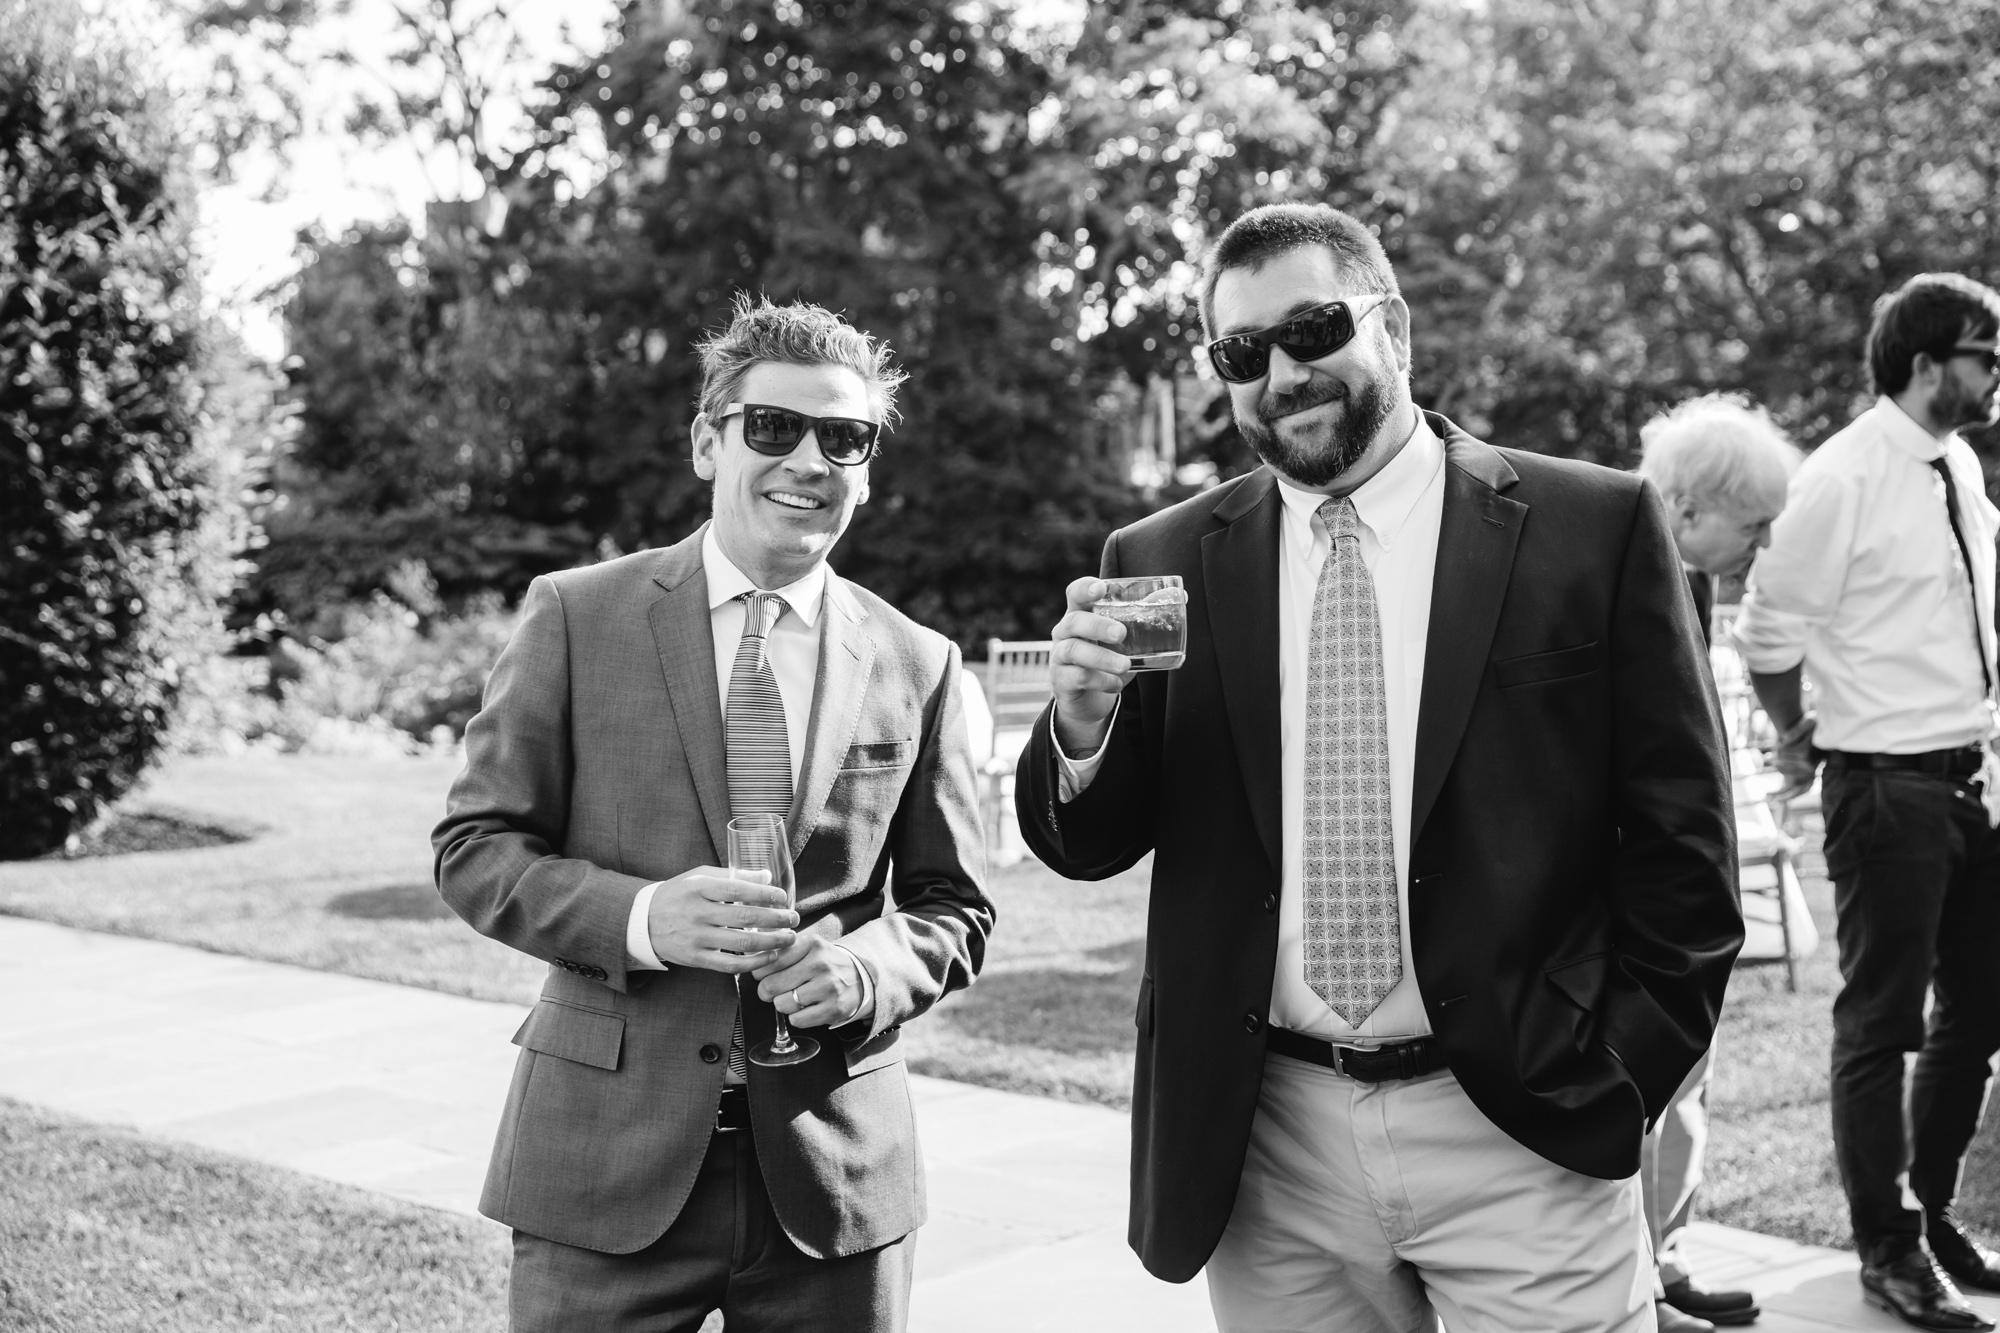 55_Rowan_Brian_The_Roundhouse_Wedding_Beacon_NY_Tanya_Salazar_Photography_625.jpg